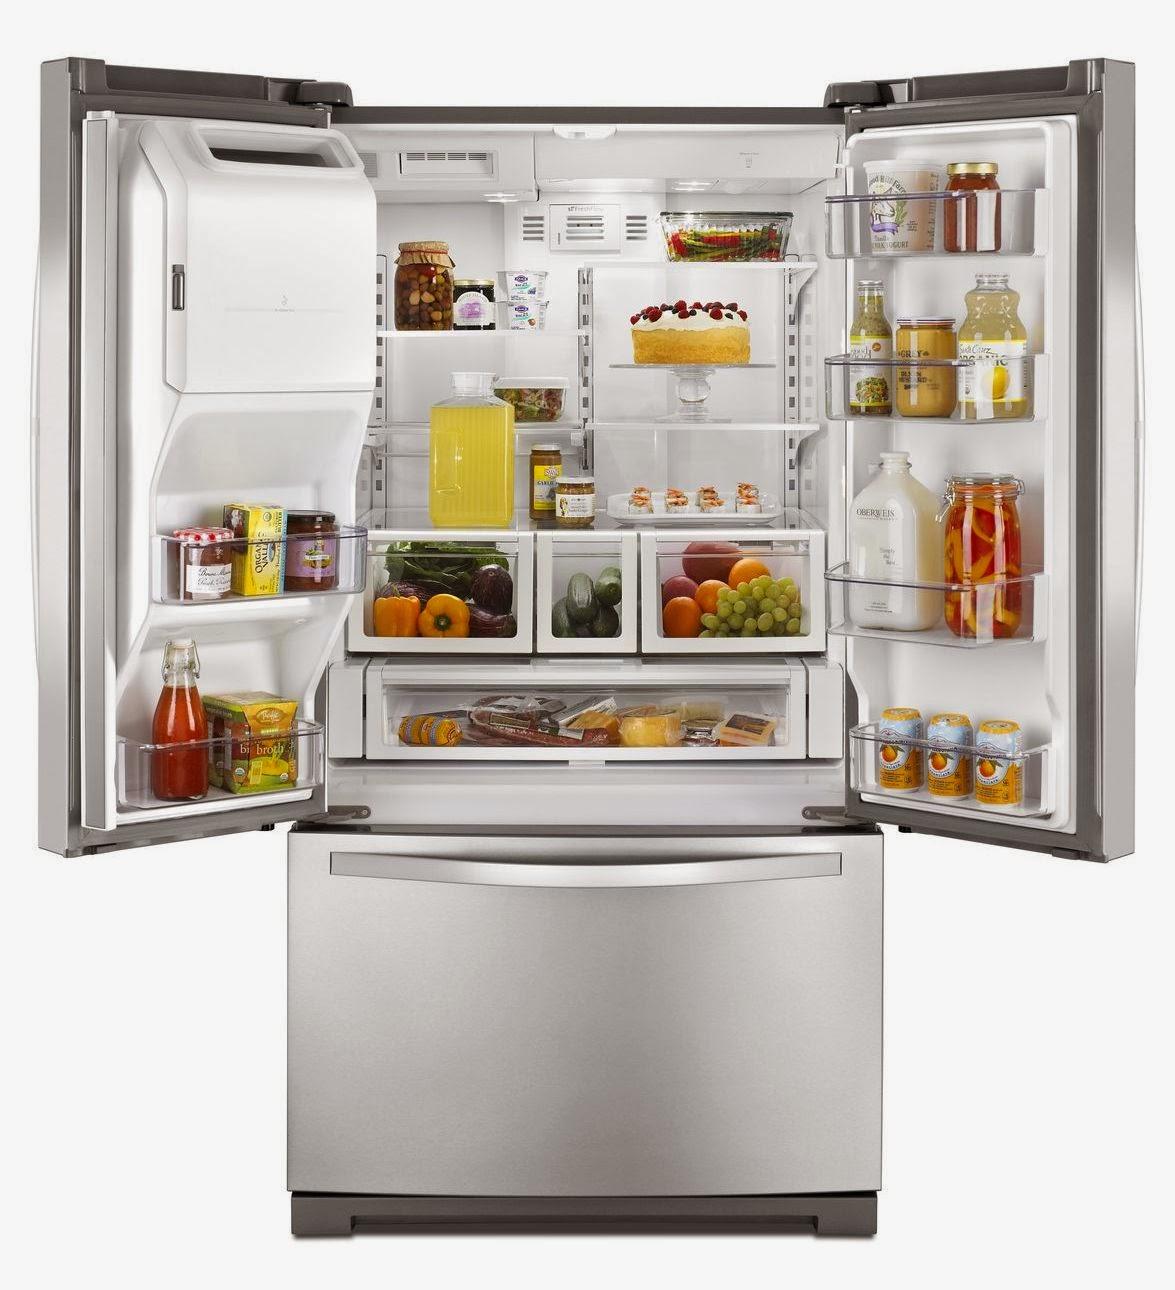 Whirlpool refrigerator brand stainless steel wrf736sdam refrigerator